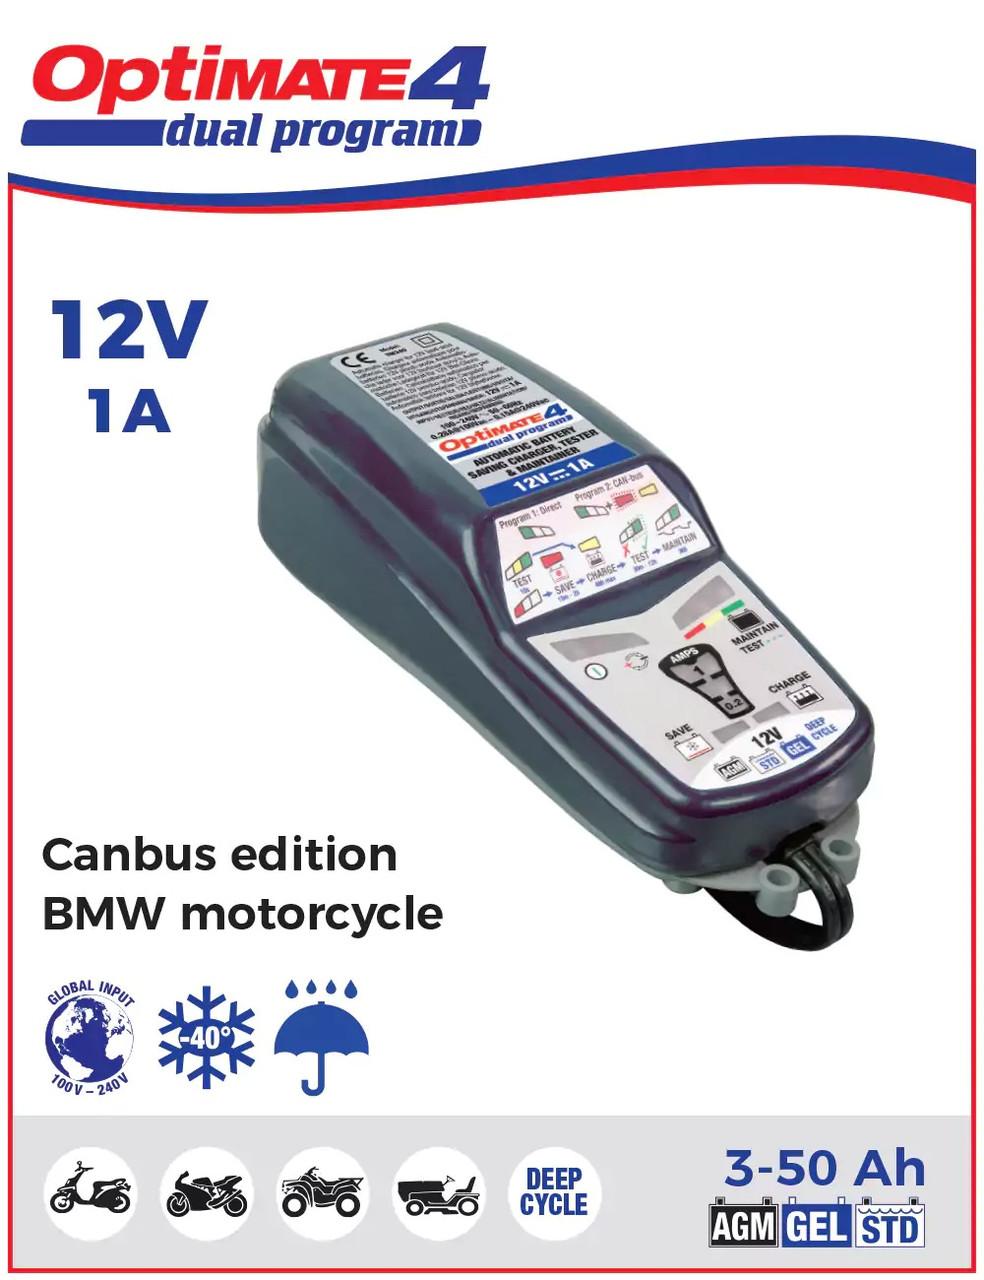 Зарядное устройство Optimate 4 TM350 BMW ready / Can-Bus Edition (1x1A, 12V)